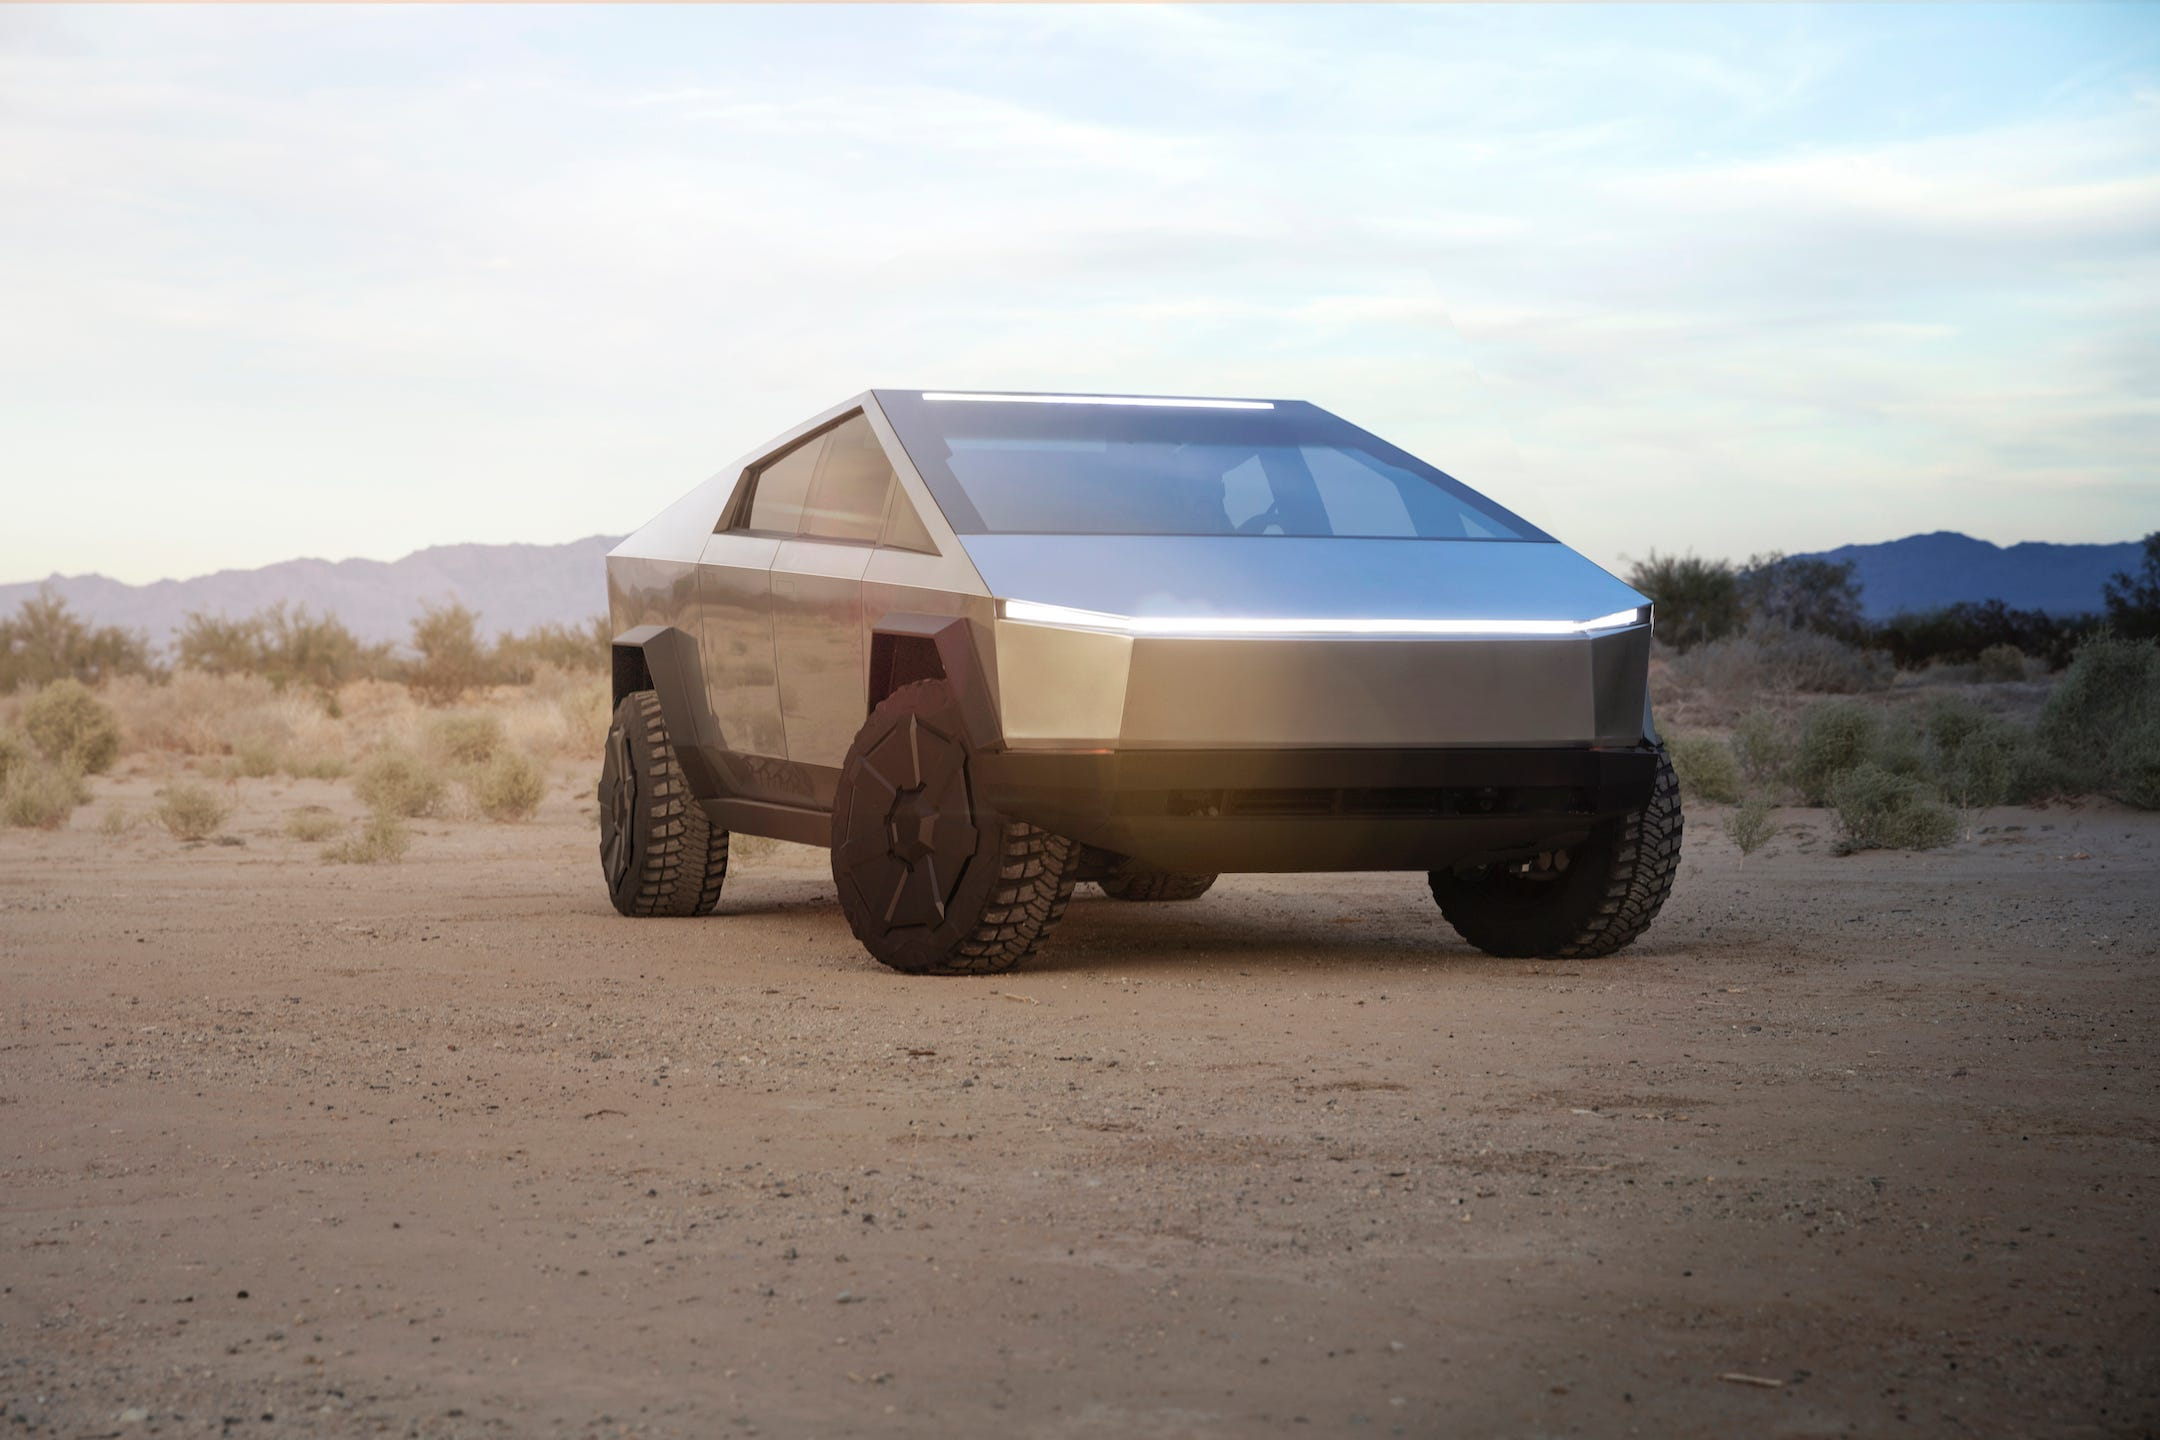 Tesla unveils 'futuristic' Cybertruck